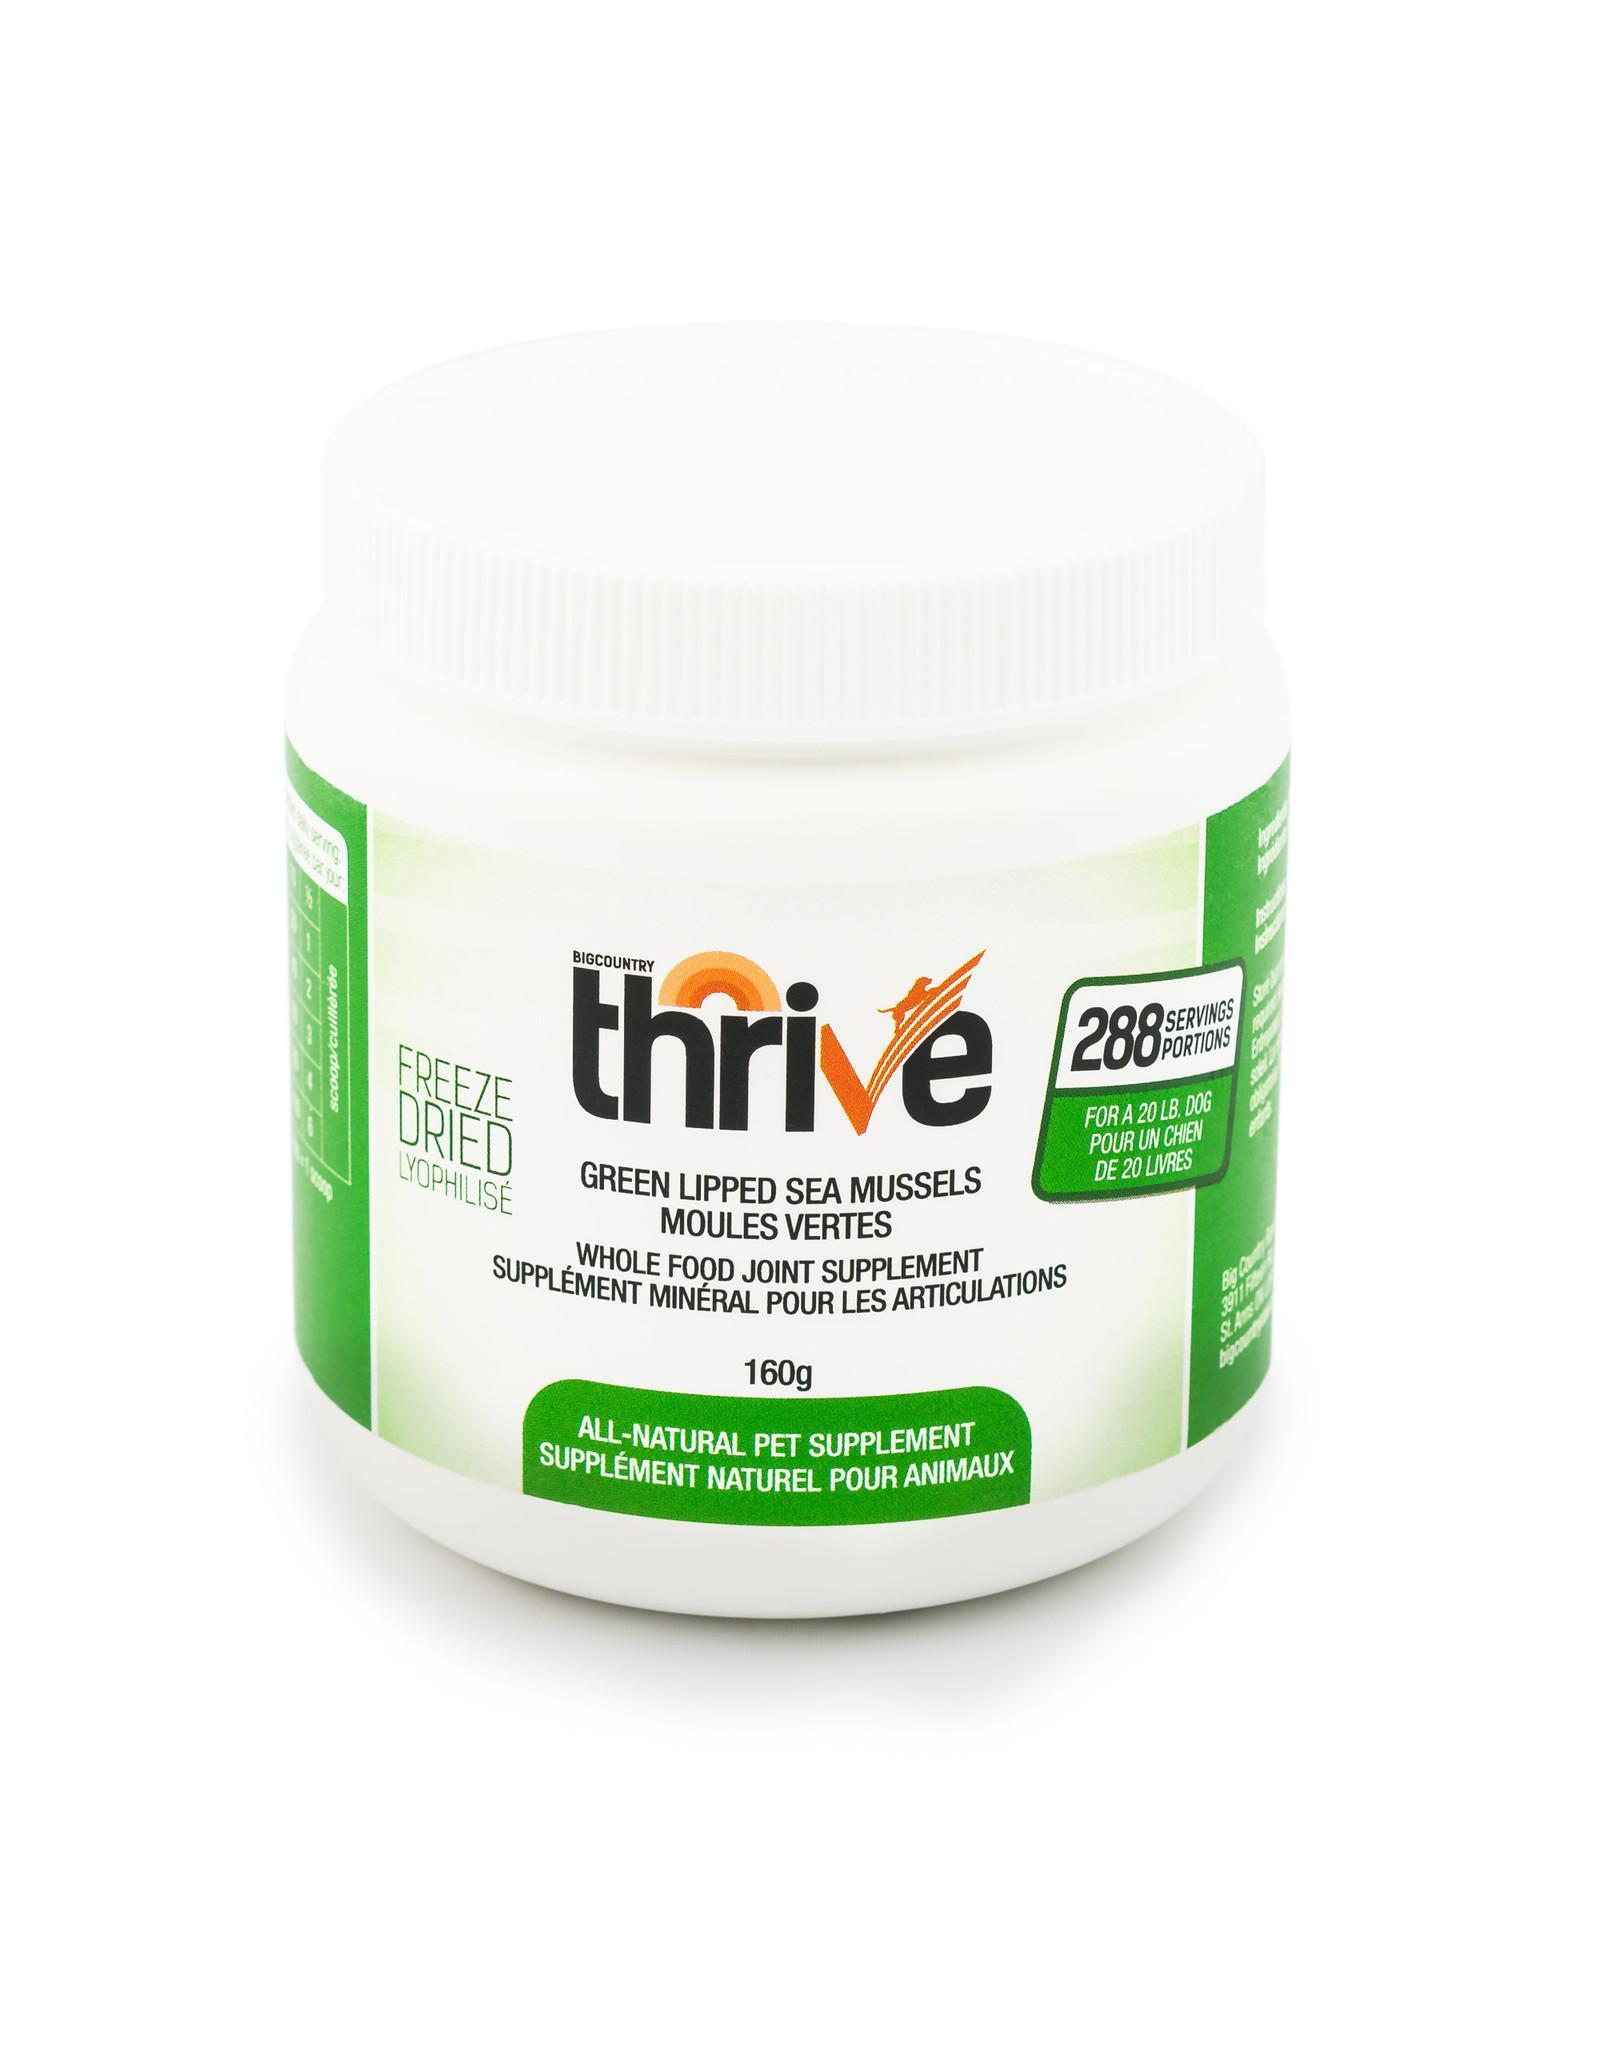 Thrive Green Lipped Mussels Dog & Cat Supplement, 160-gram